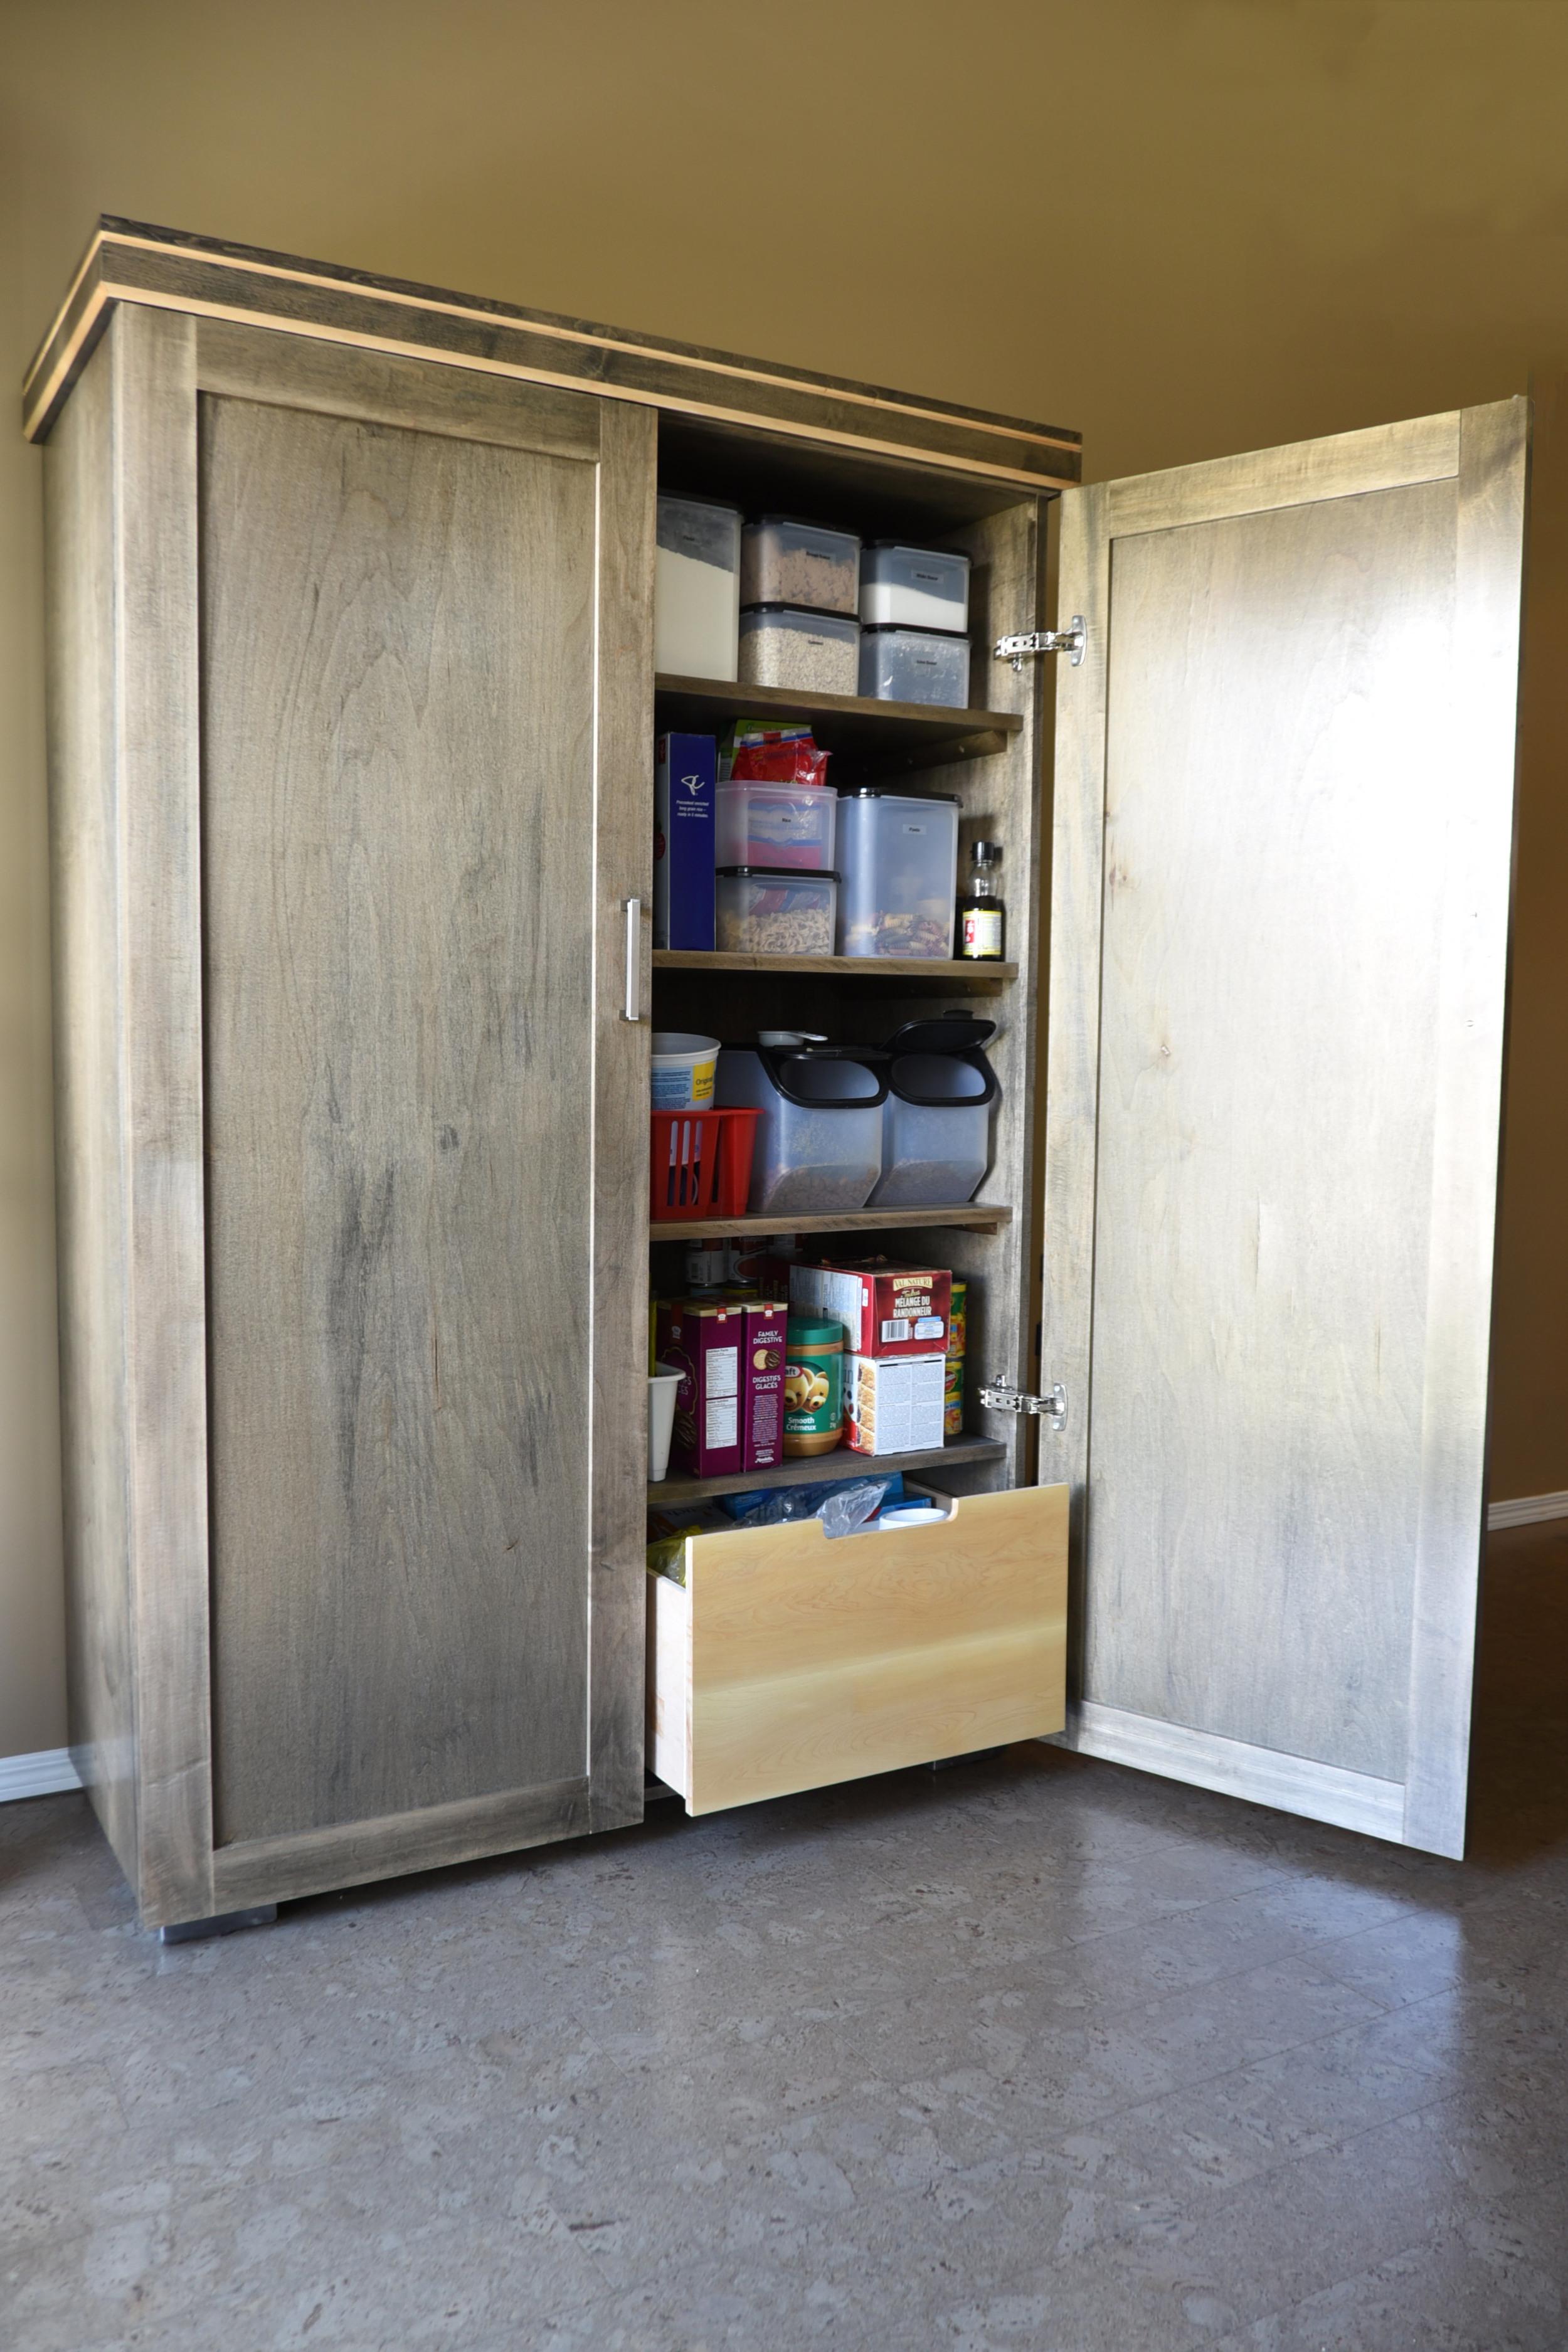 mortise-and-tenon-pantry.jpg